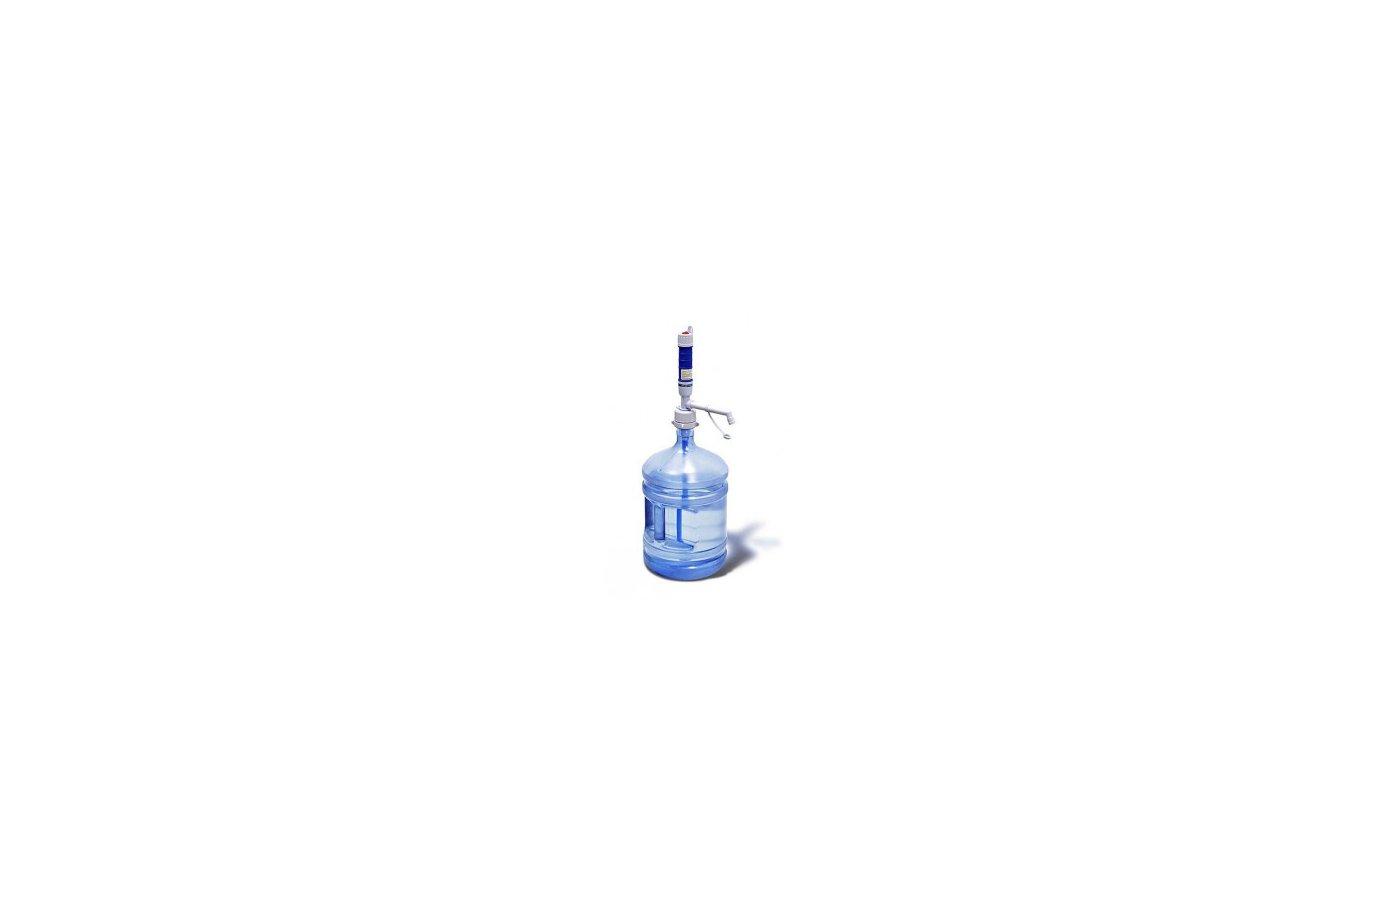 Кулер HotFrost A10 помпа для бутылей